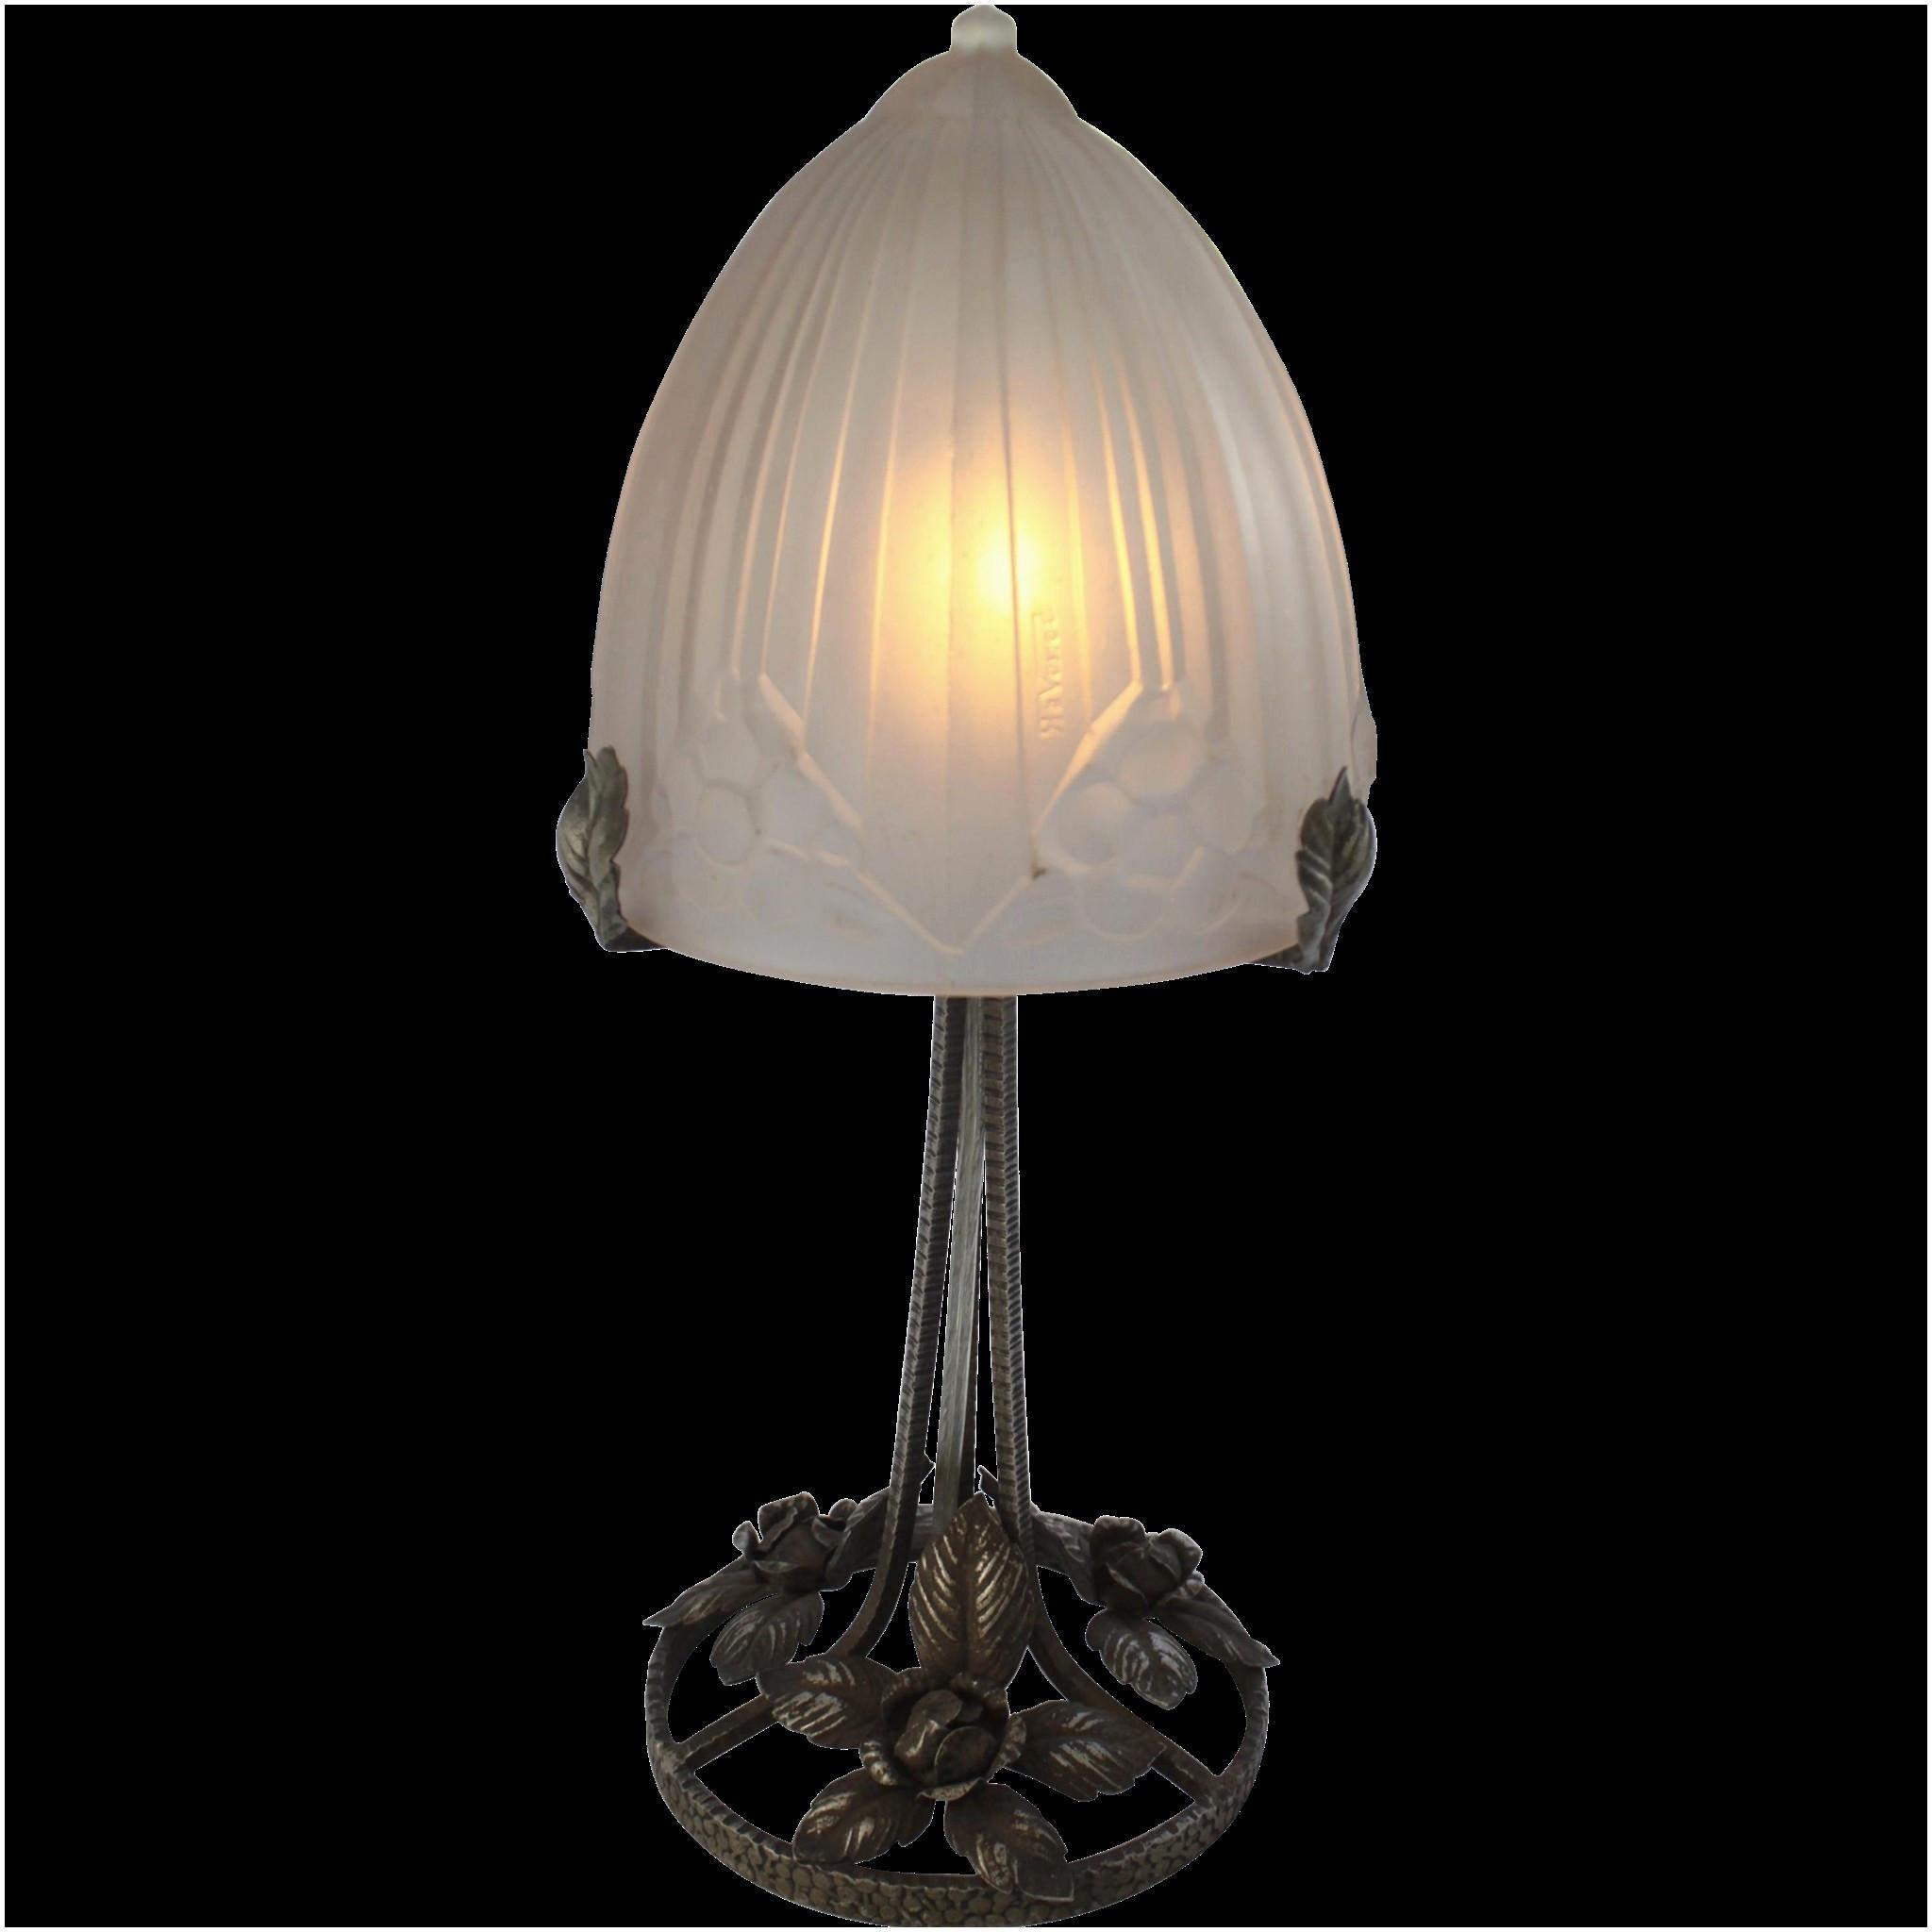 led base lights for vases of 27a‰lagant led decoration anciendemutu org inside led lights for home interior new lamps lamp art lamp art 0d lampss design